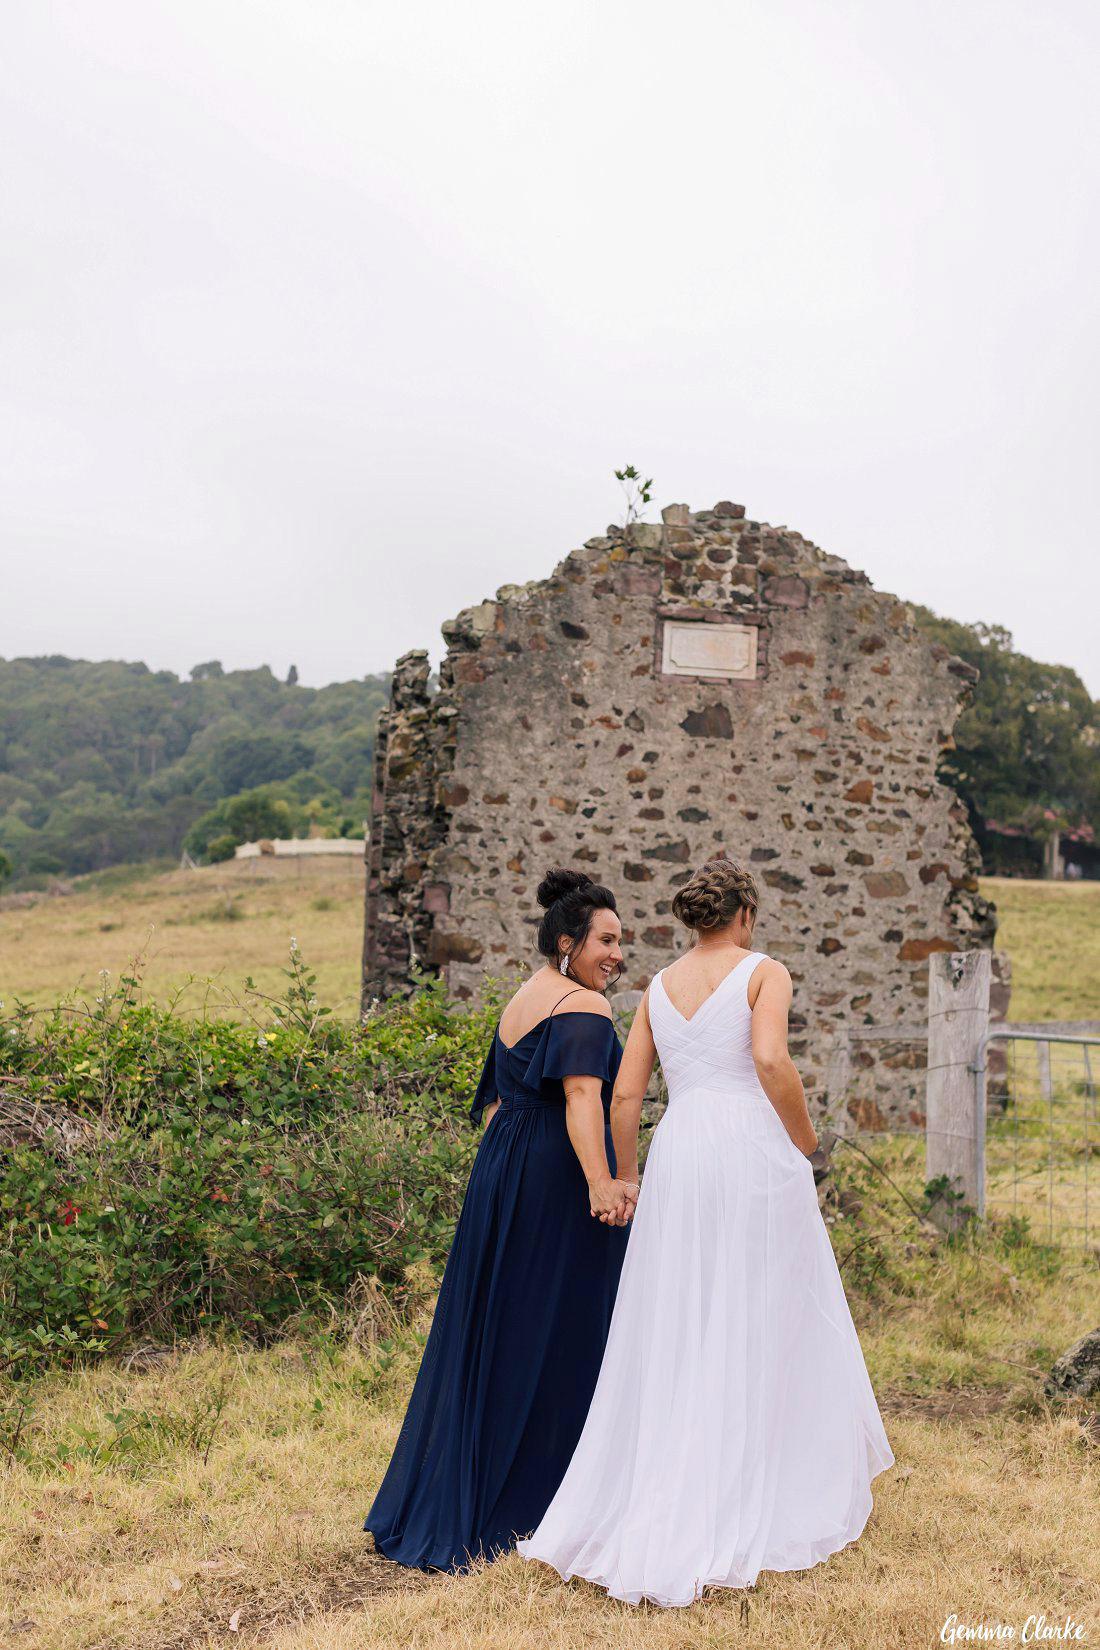 More stone building ruins as the brides walk through the paddock at their Bush Bank Kiama Wedding